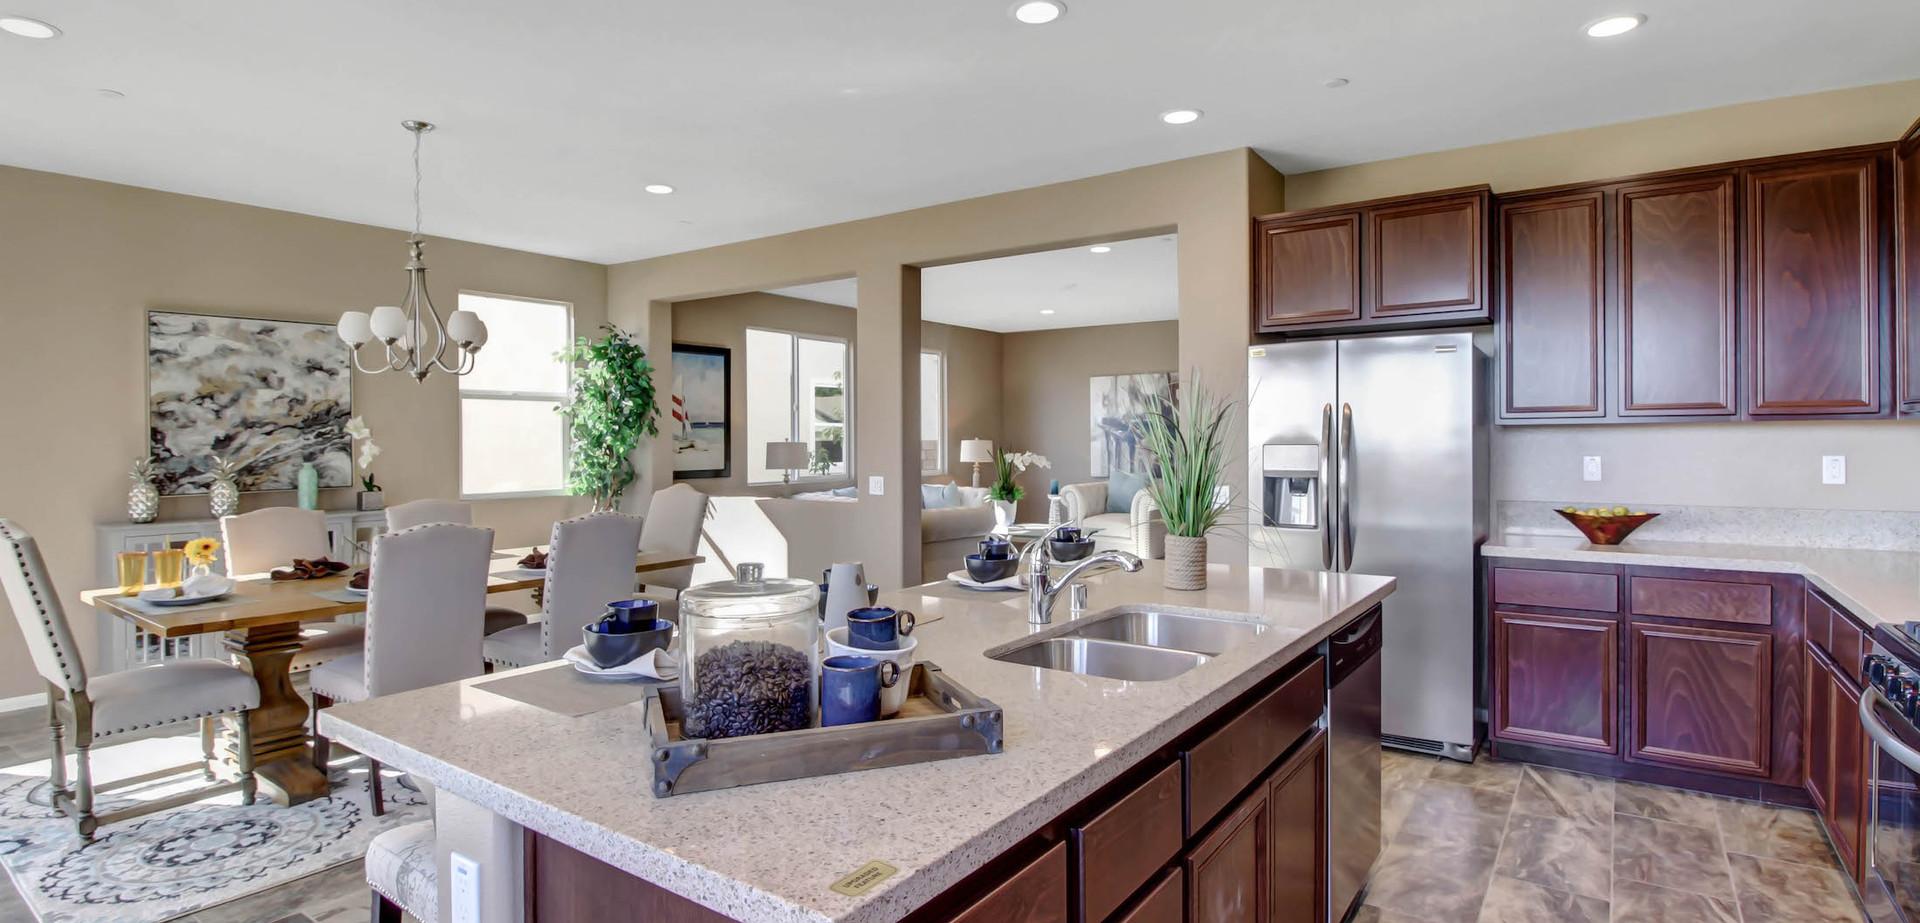 model-2 kitchen-2 2200x1500.jpg